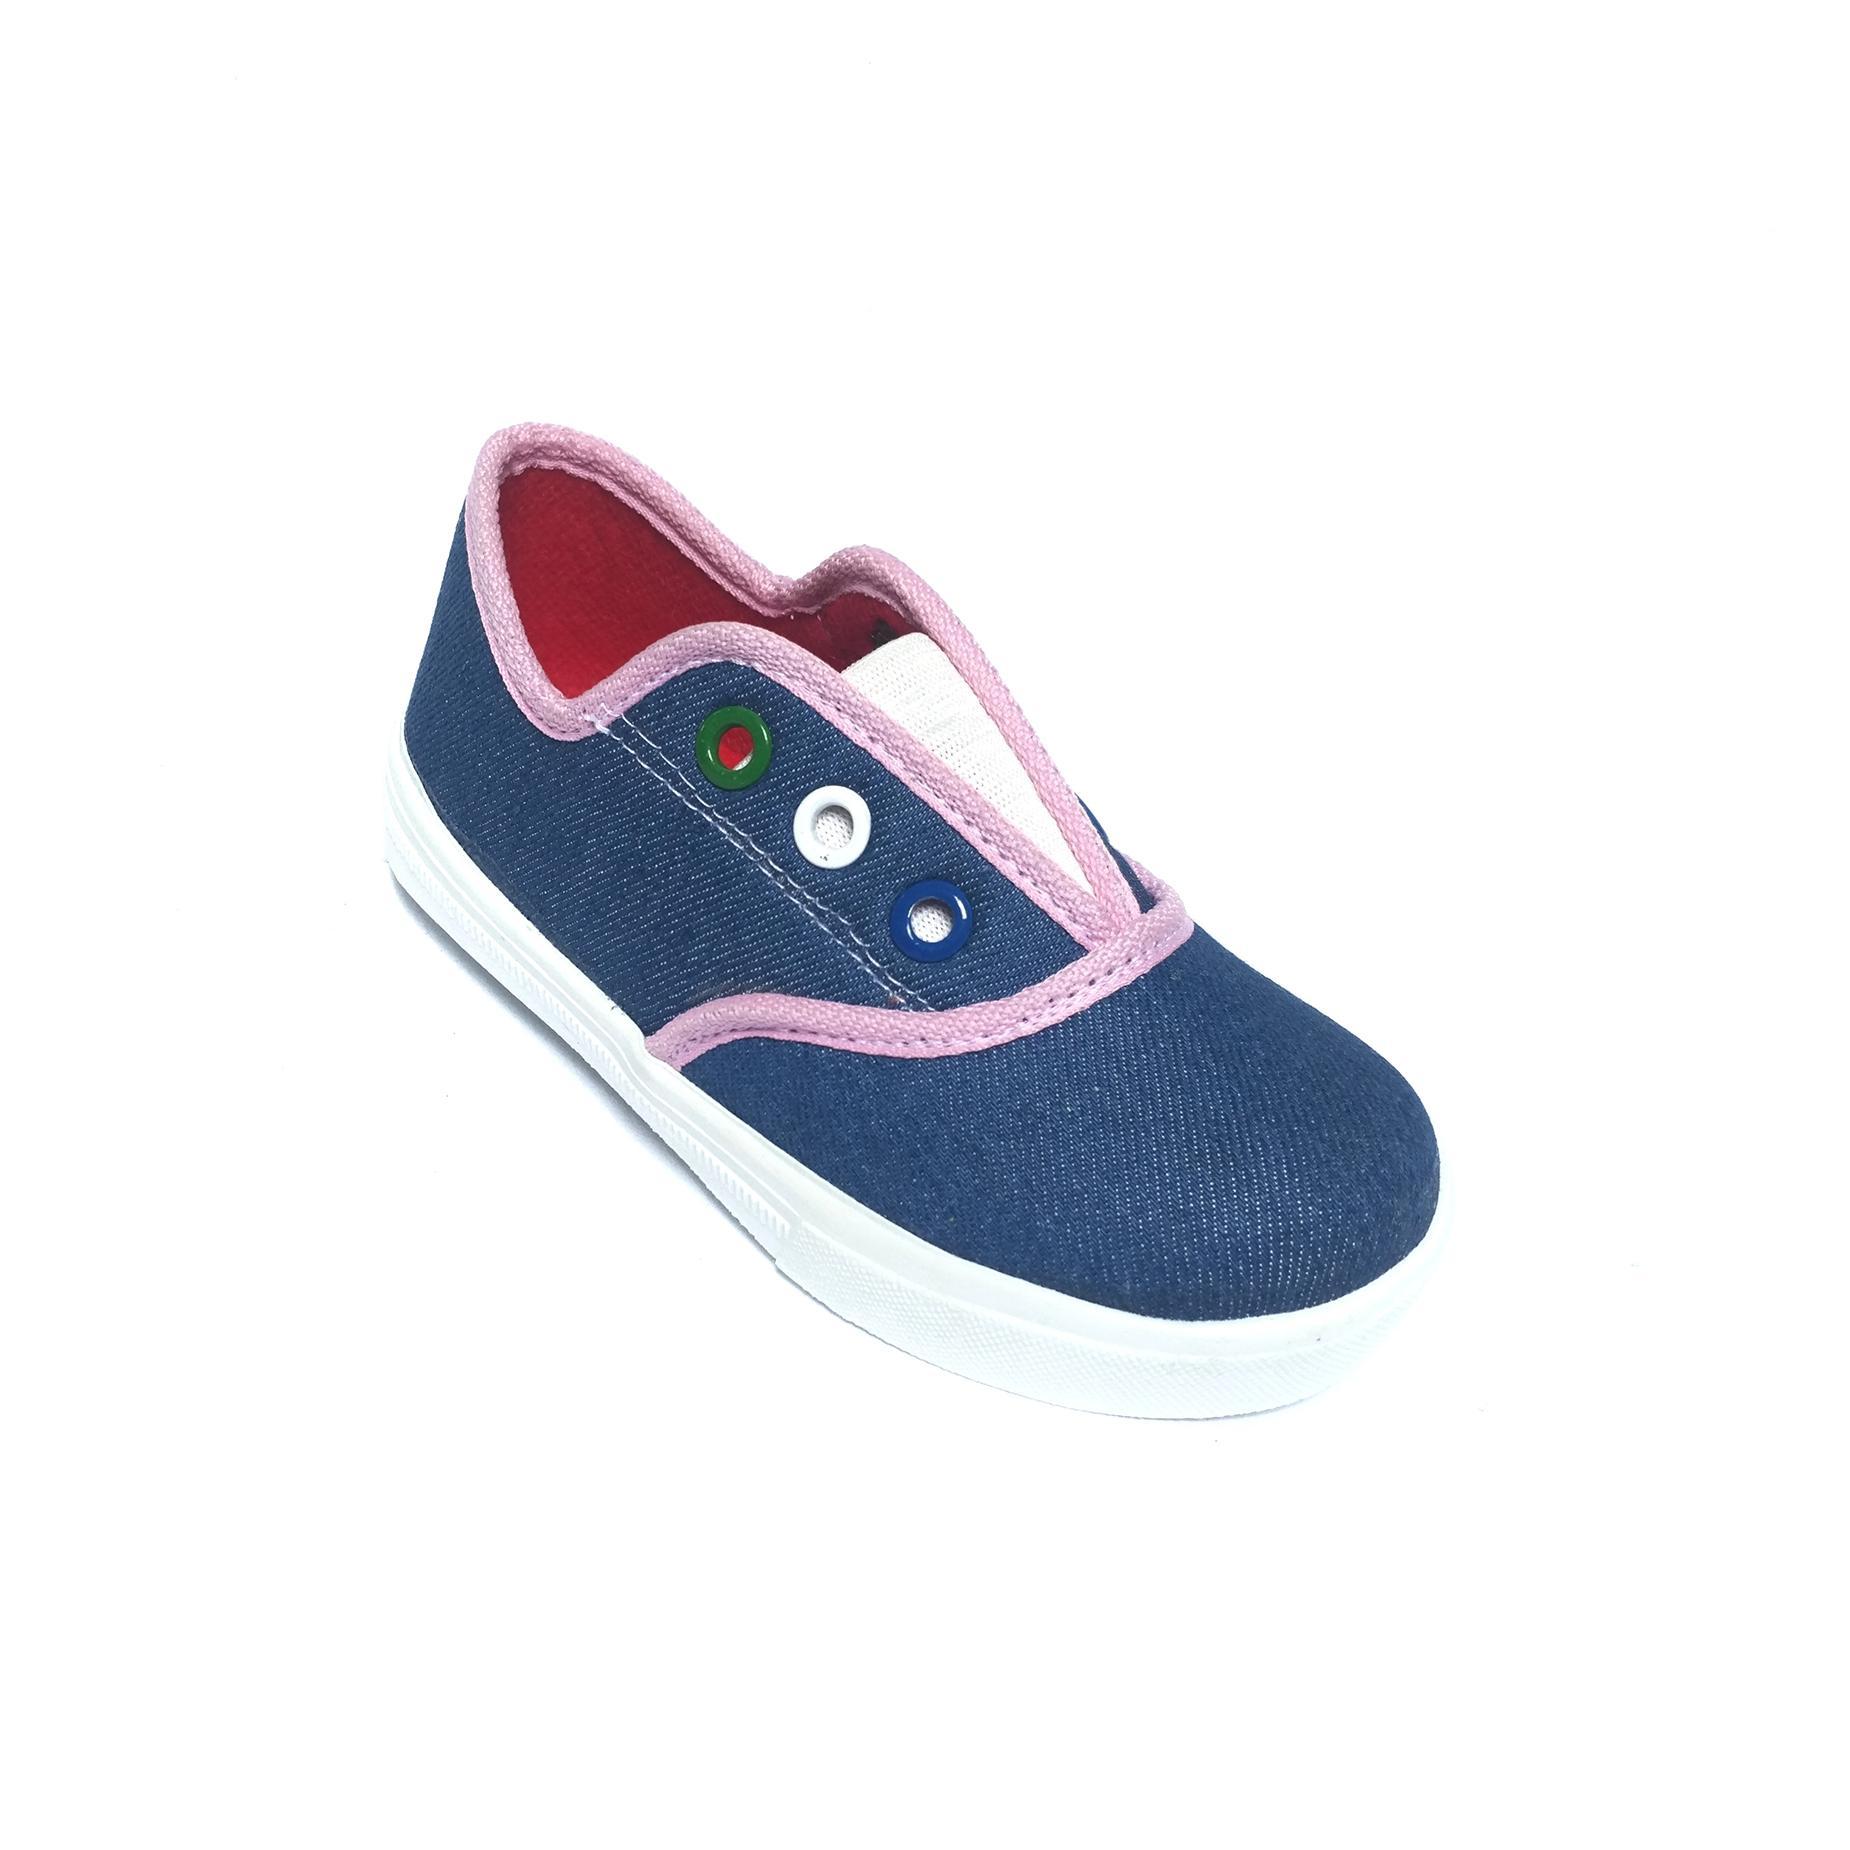 Sepatu anak bayi perempuan slip on jeans